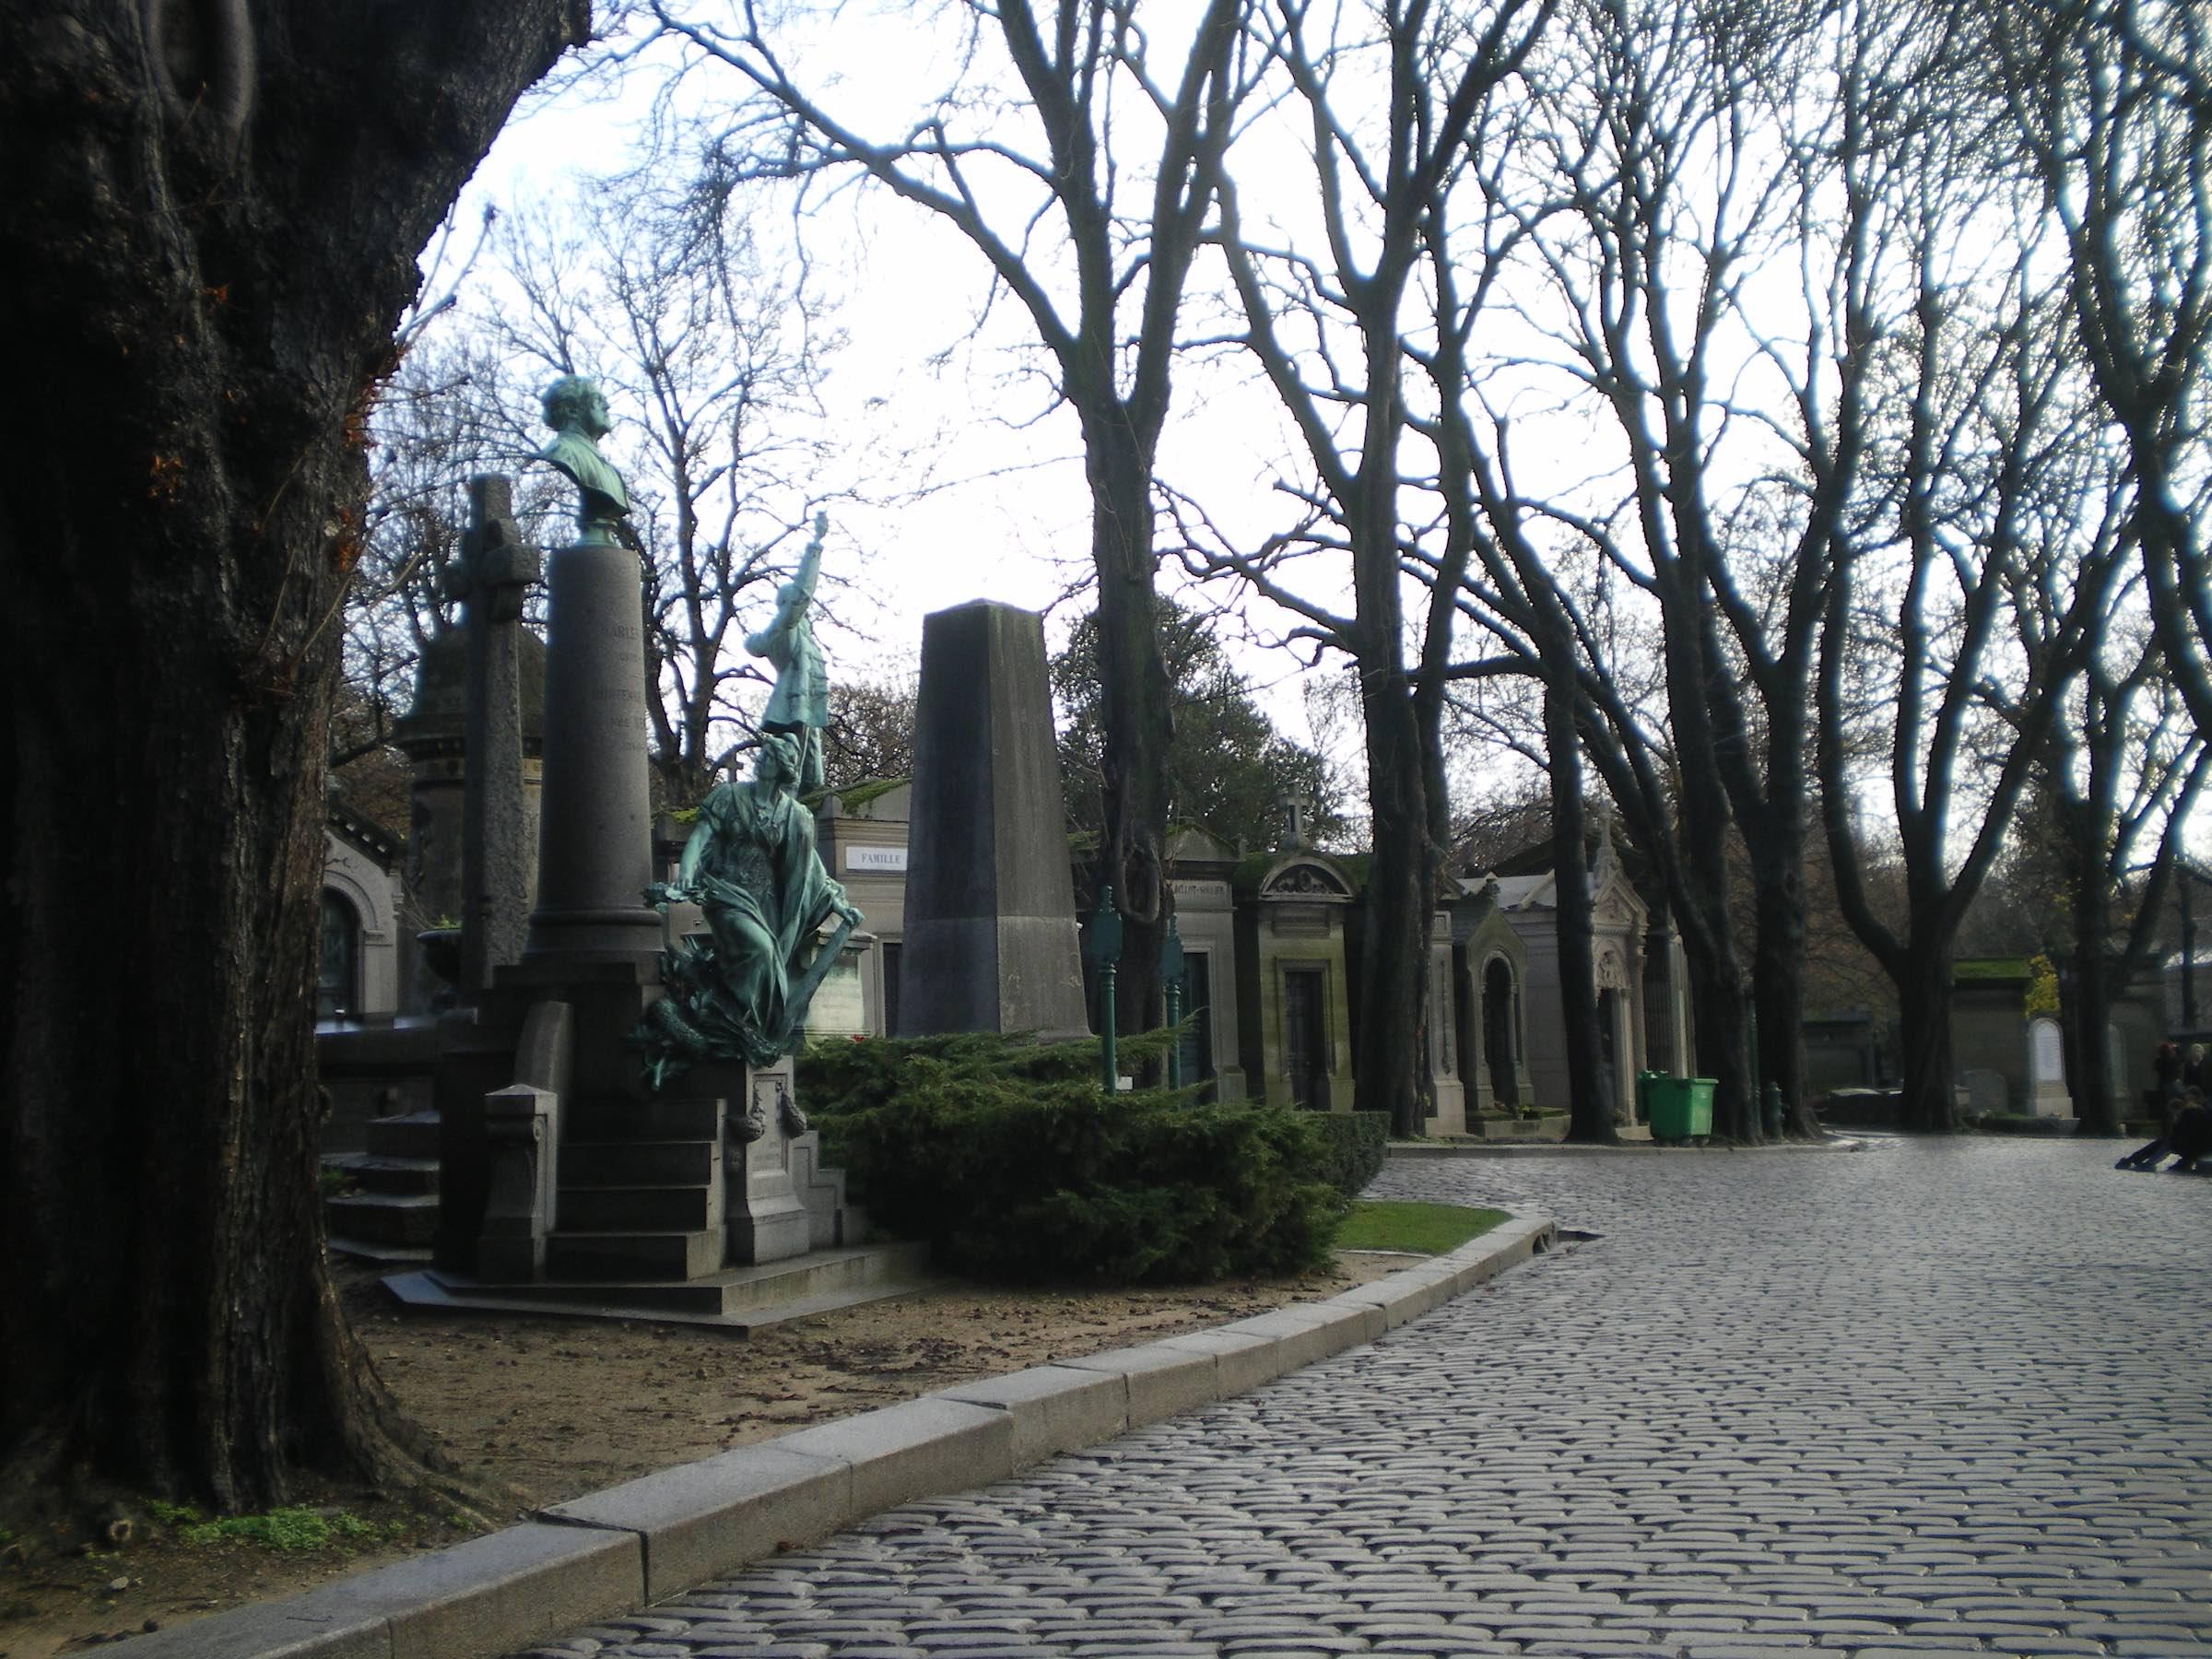 Le Pere Lachaise Cemetery in Paris